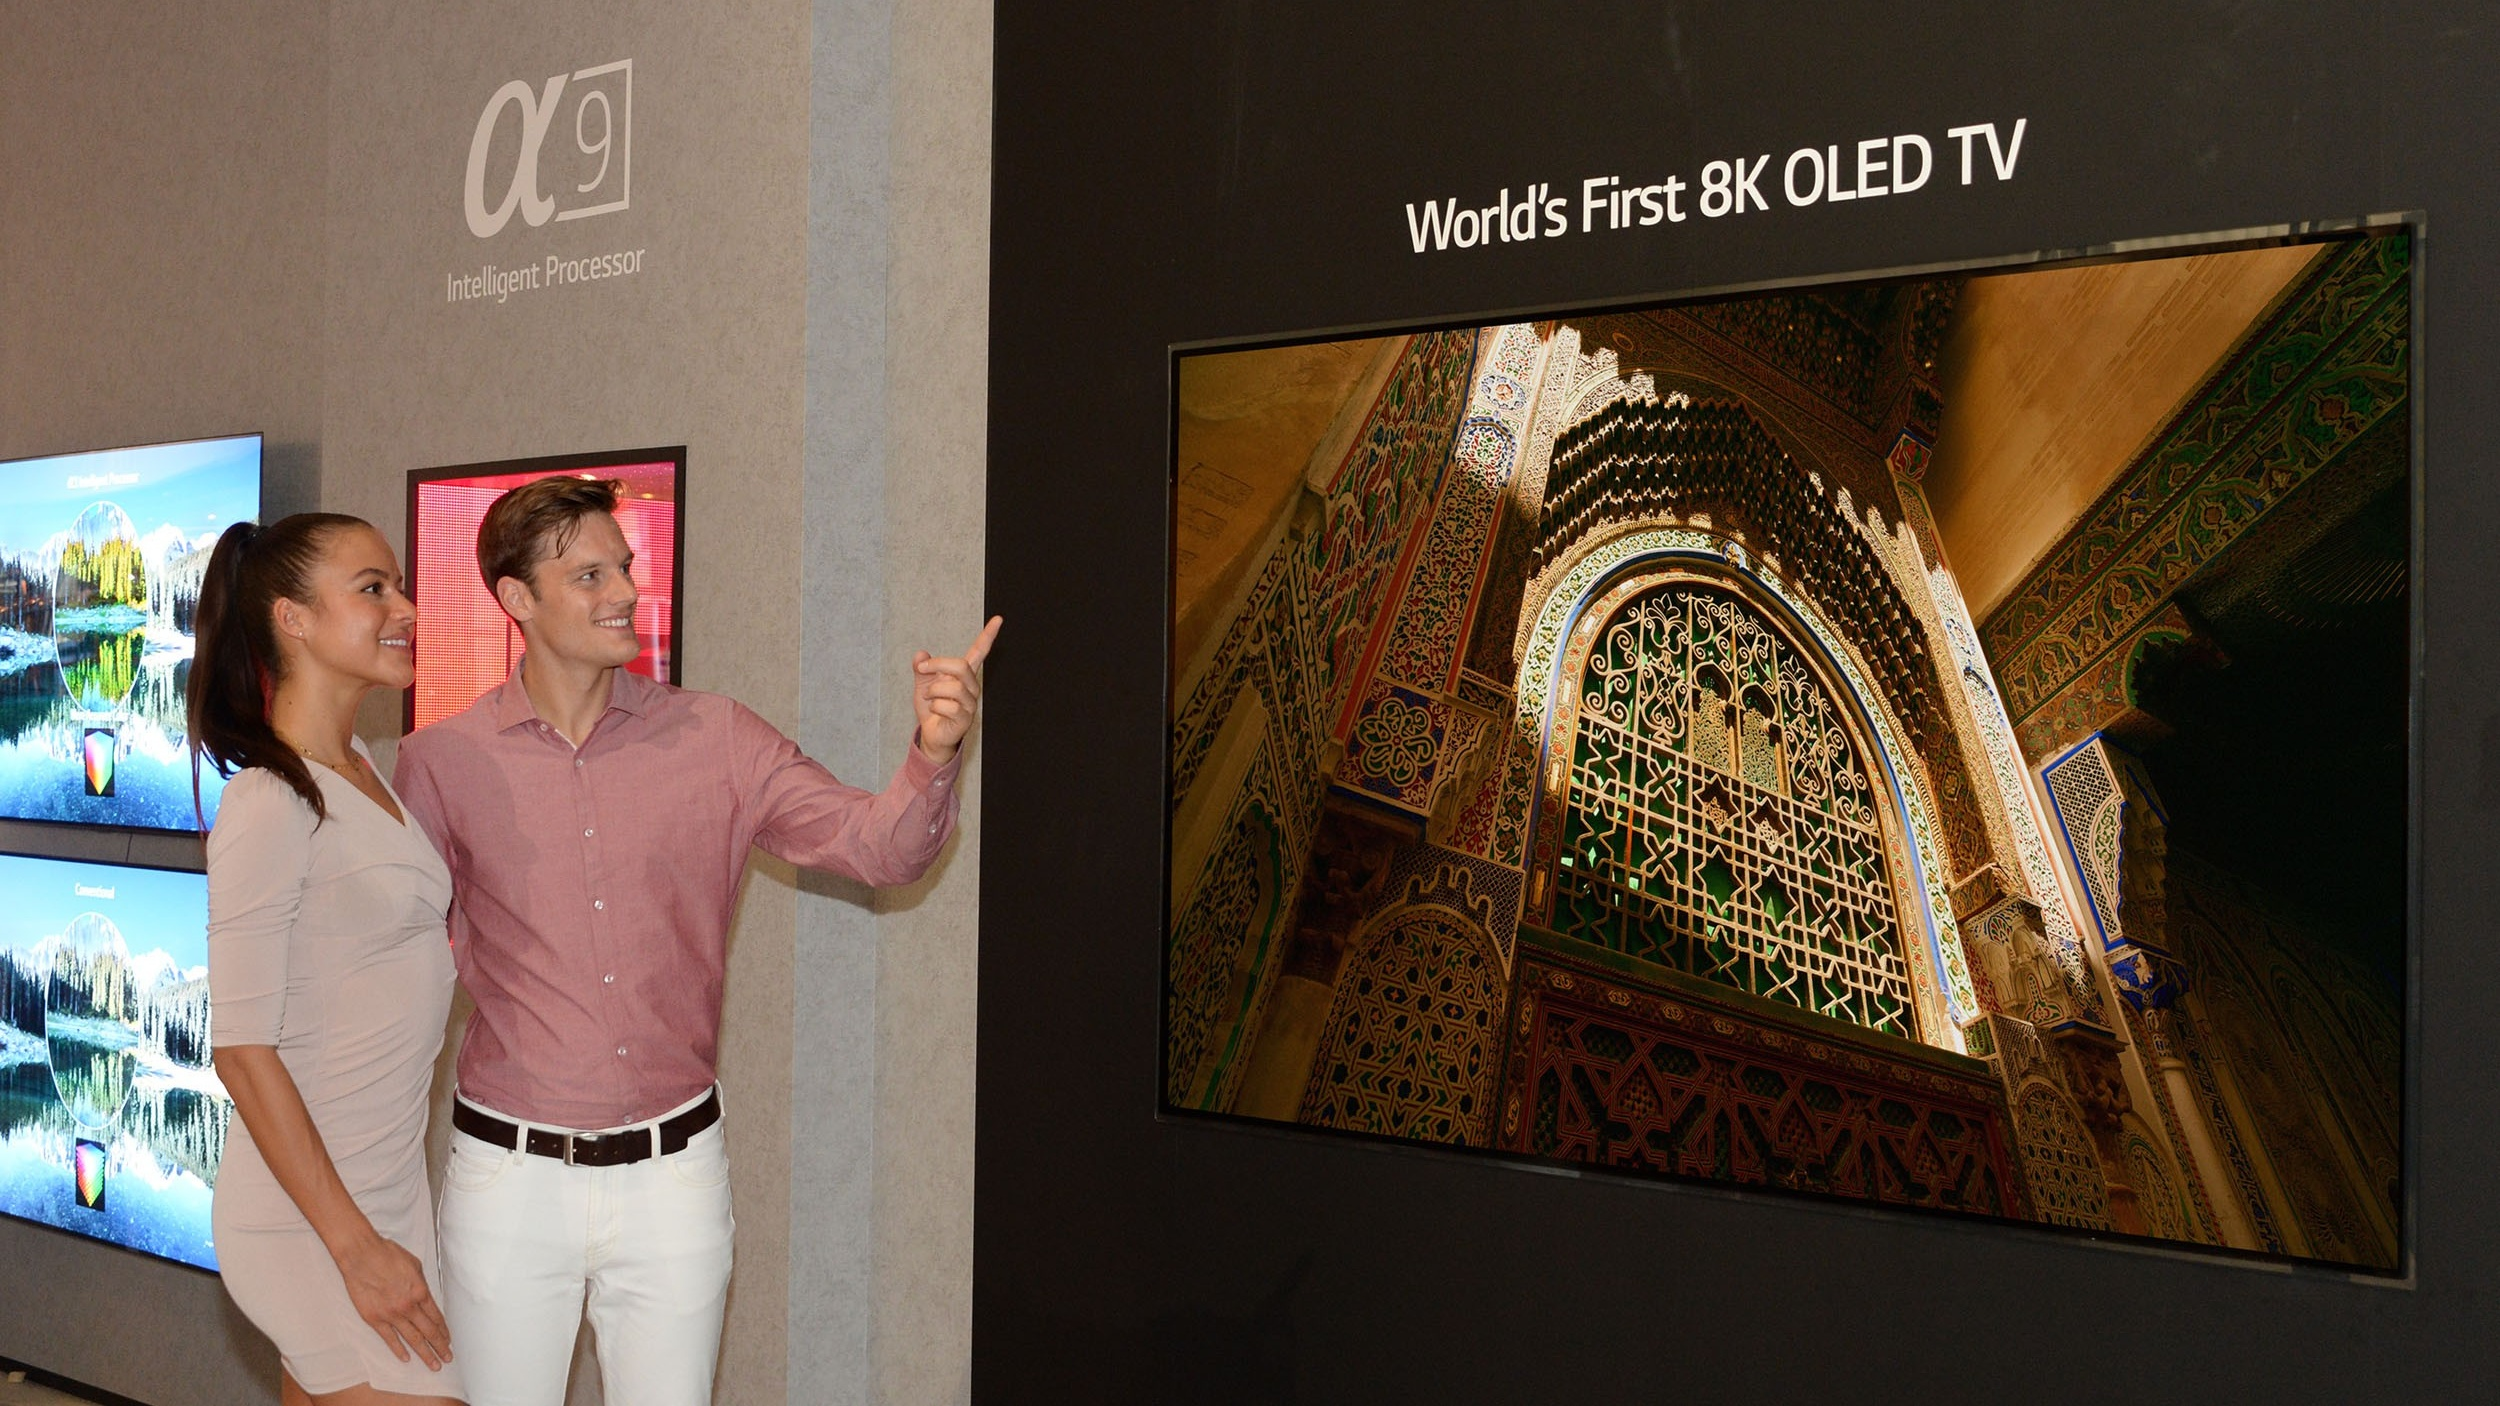 Samsung unveils 8K QLED TV